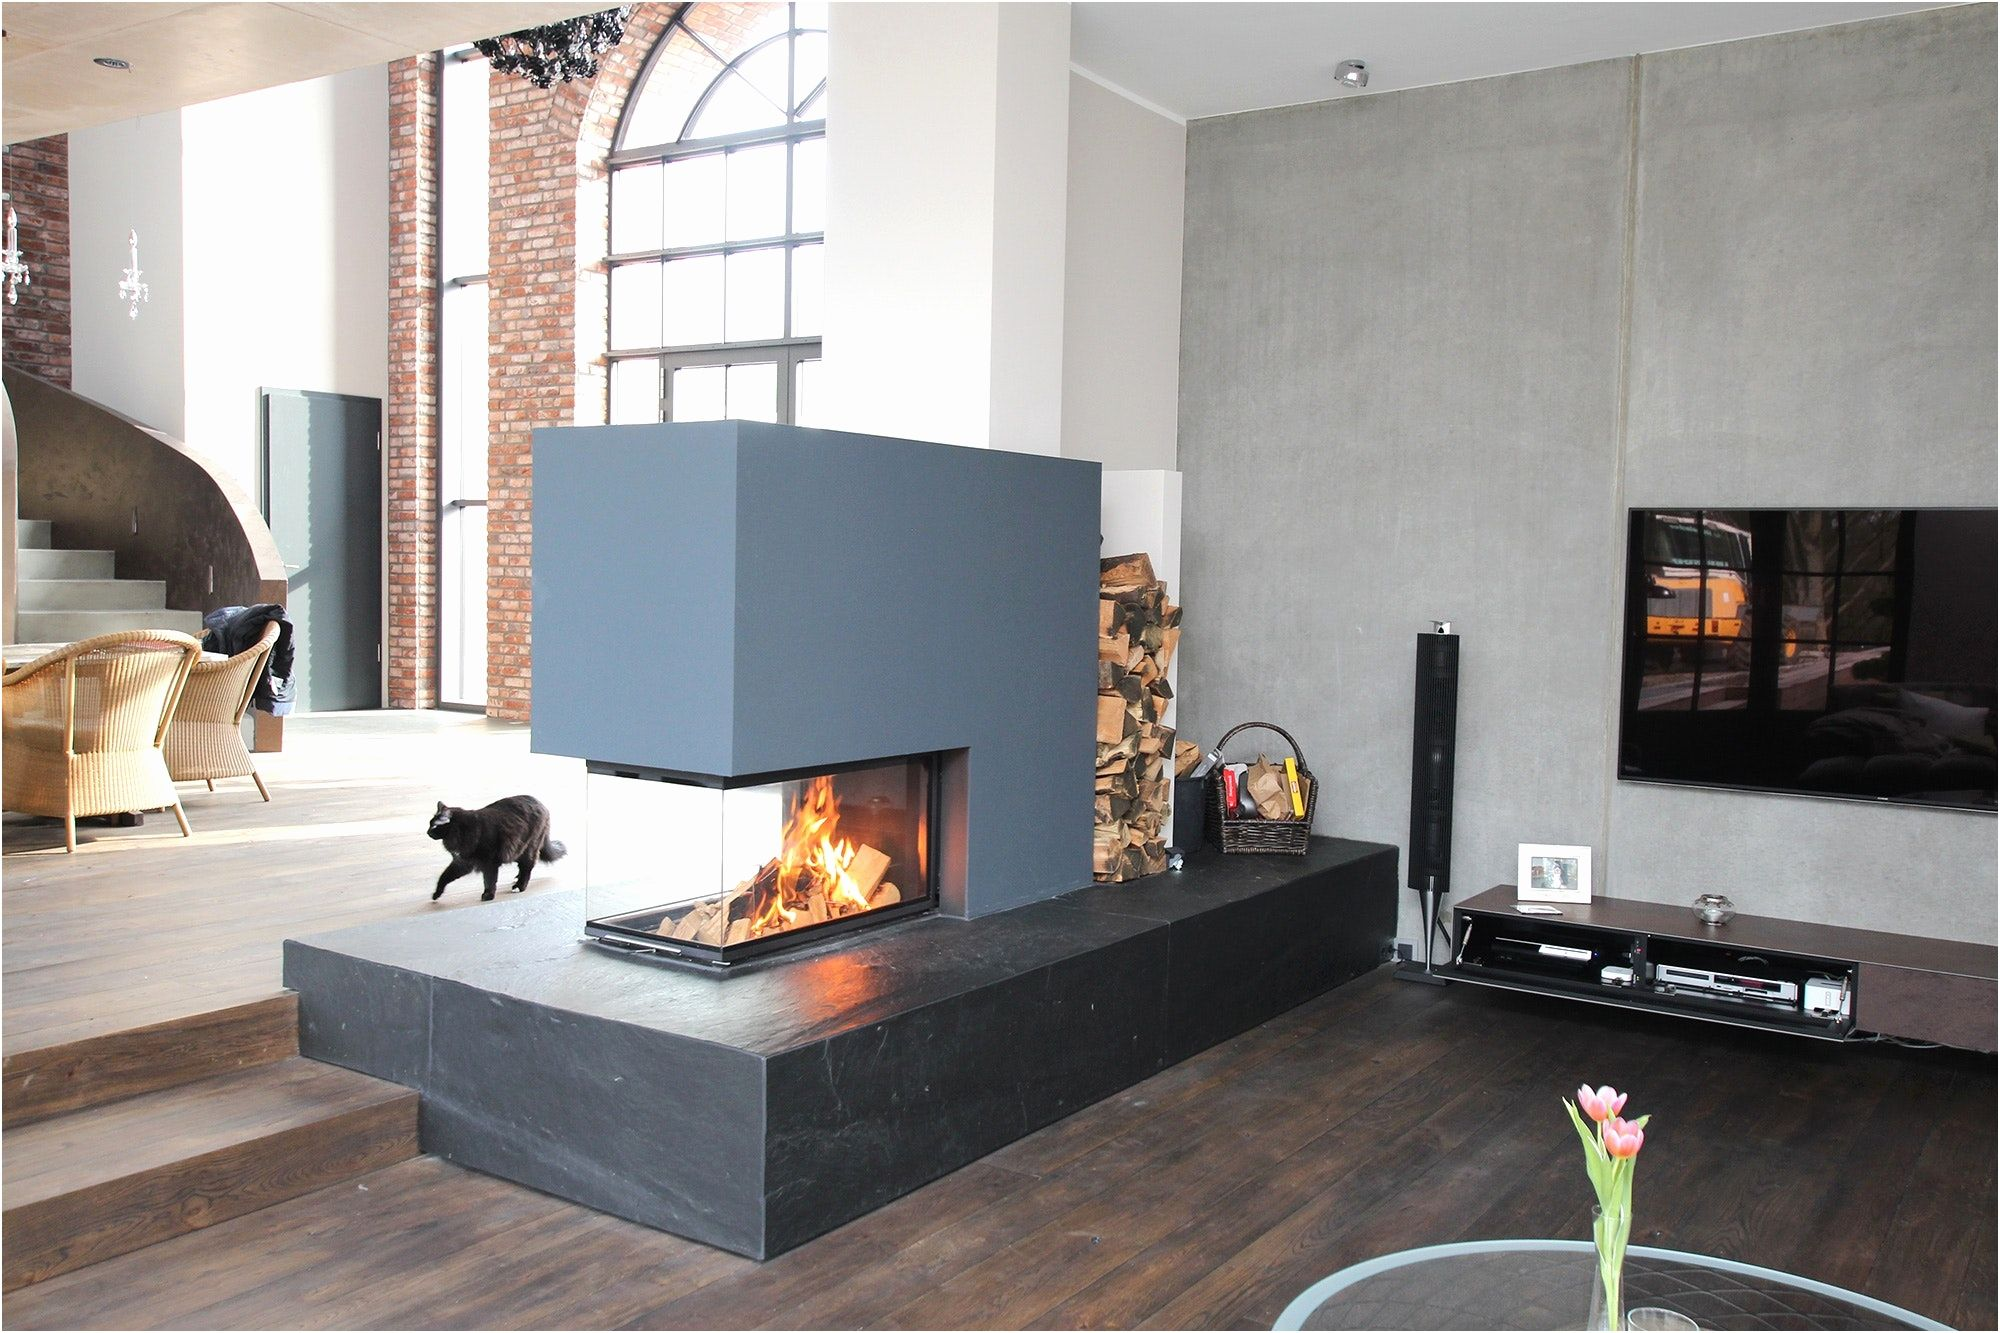 bildergebnis f r kamin mit sitzbank yazlik pinterest. Black Bedroom Furniture Sets. Home Design Ideas